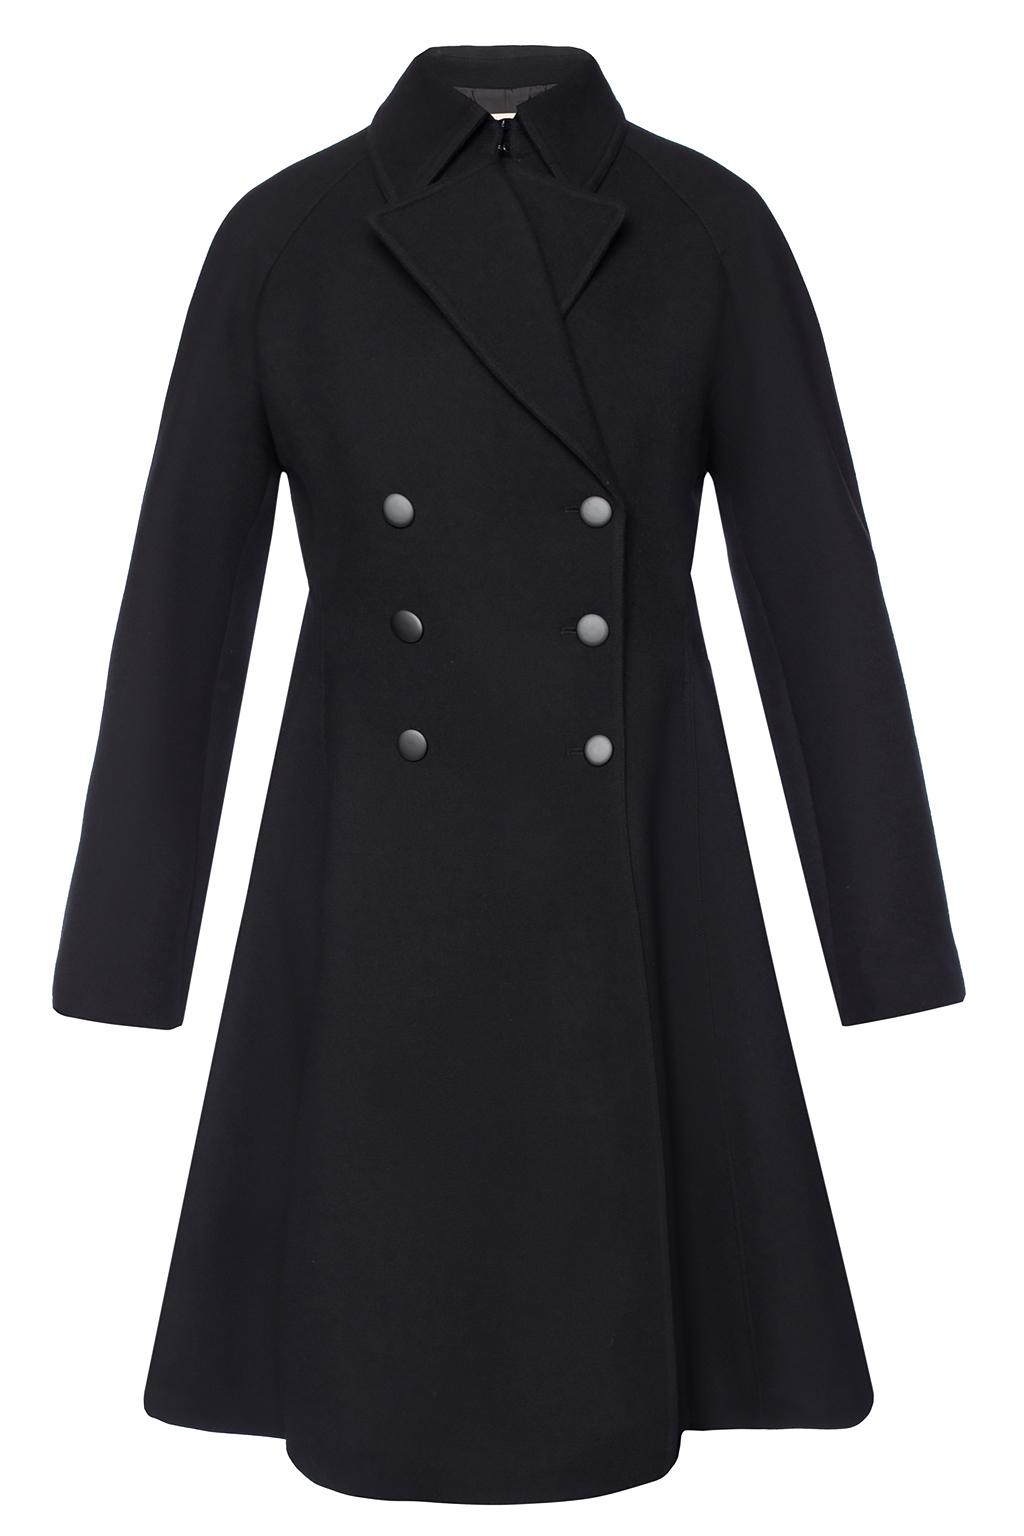 Alaia Ruffled double-breasted coat